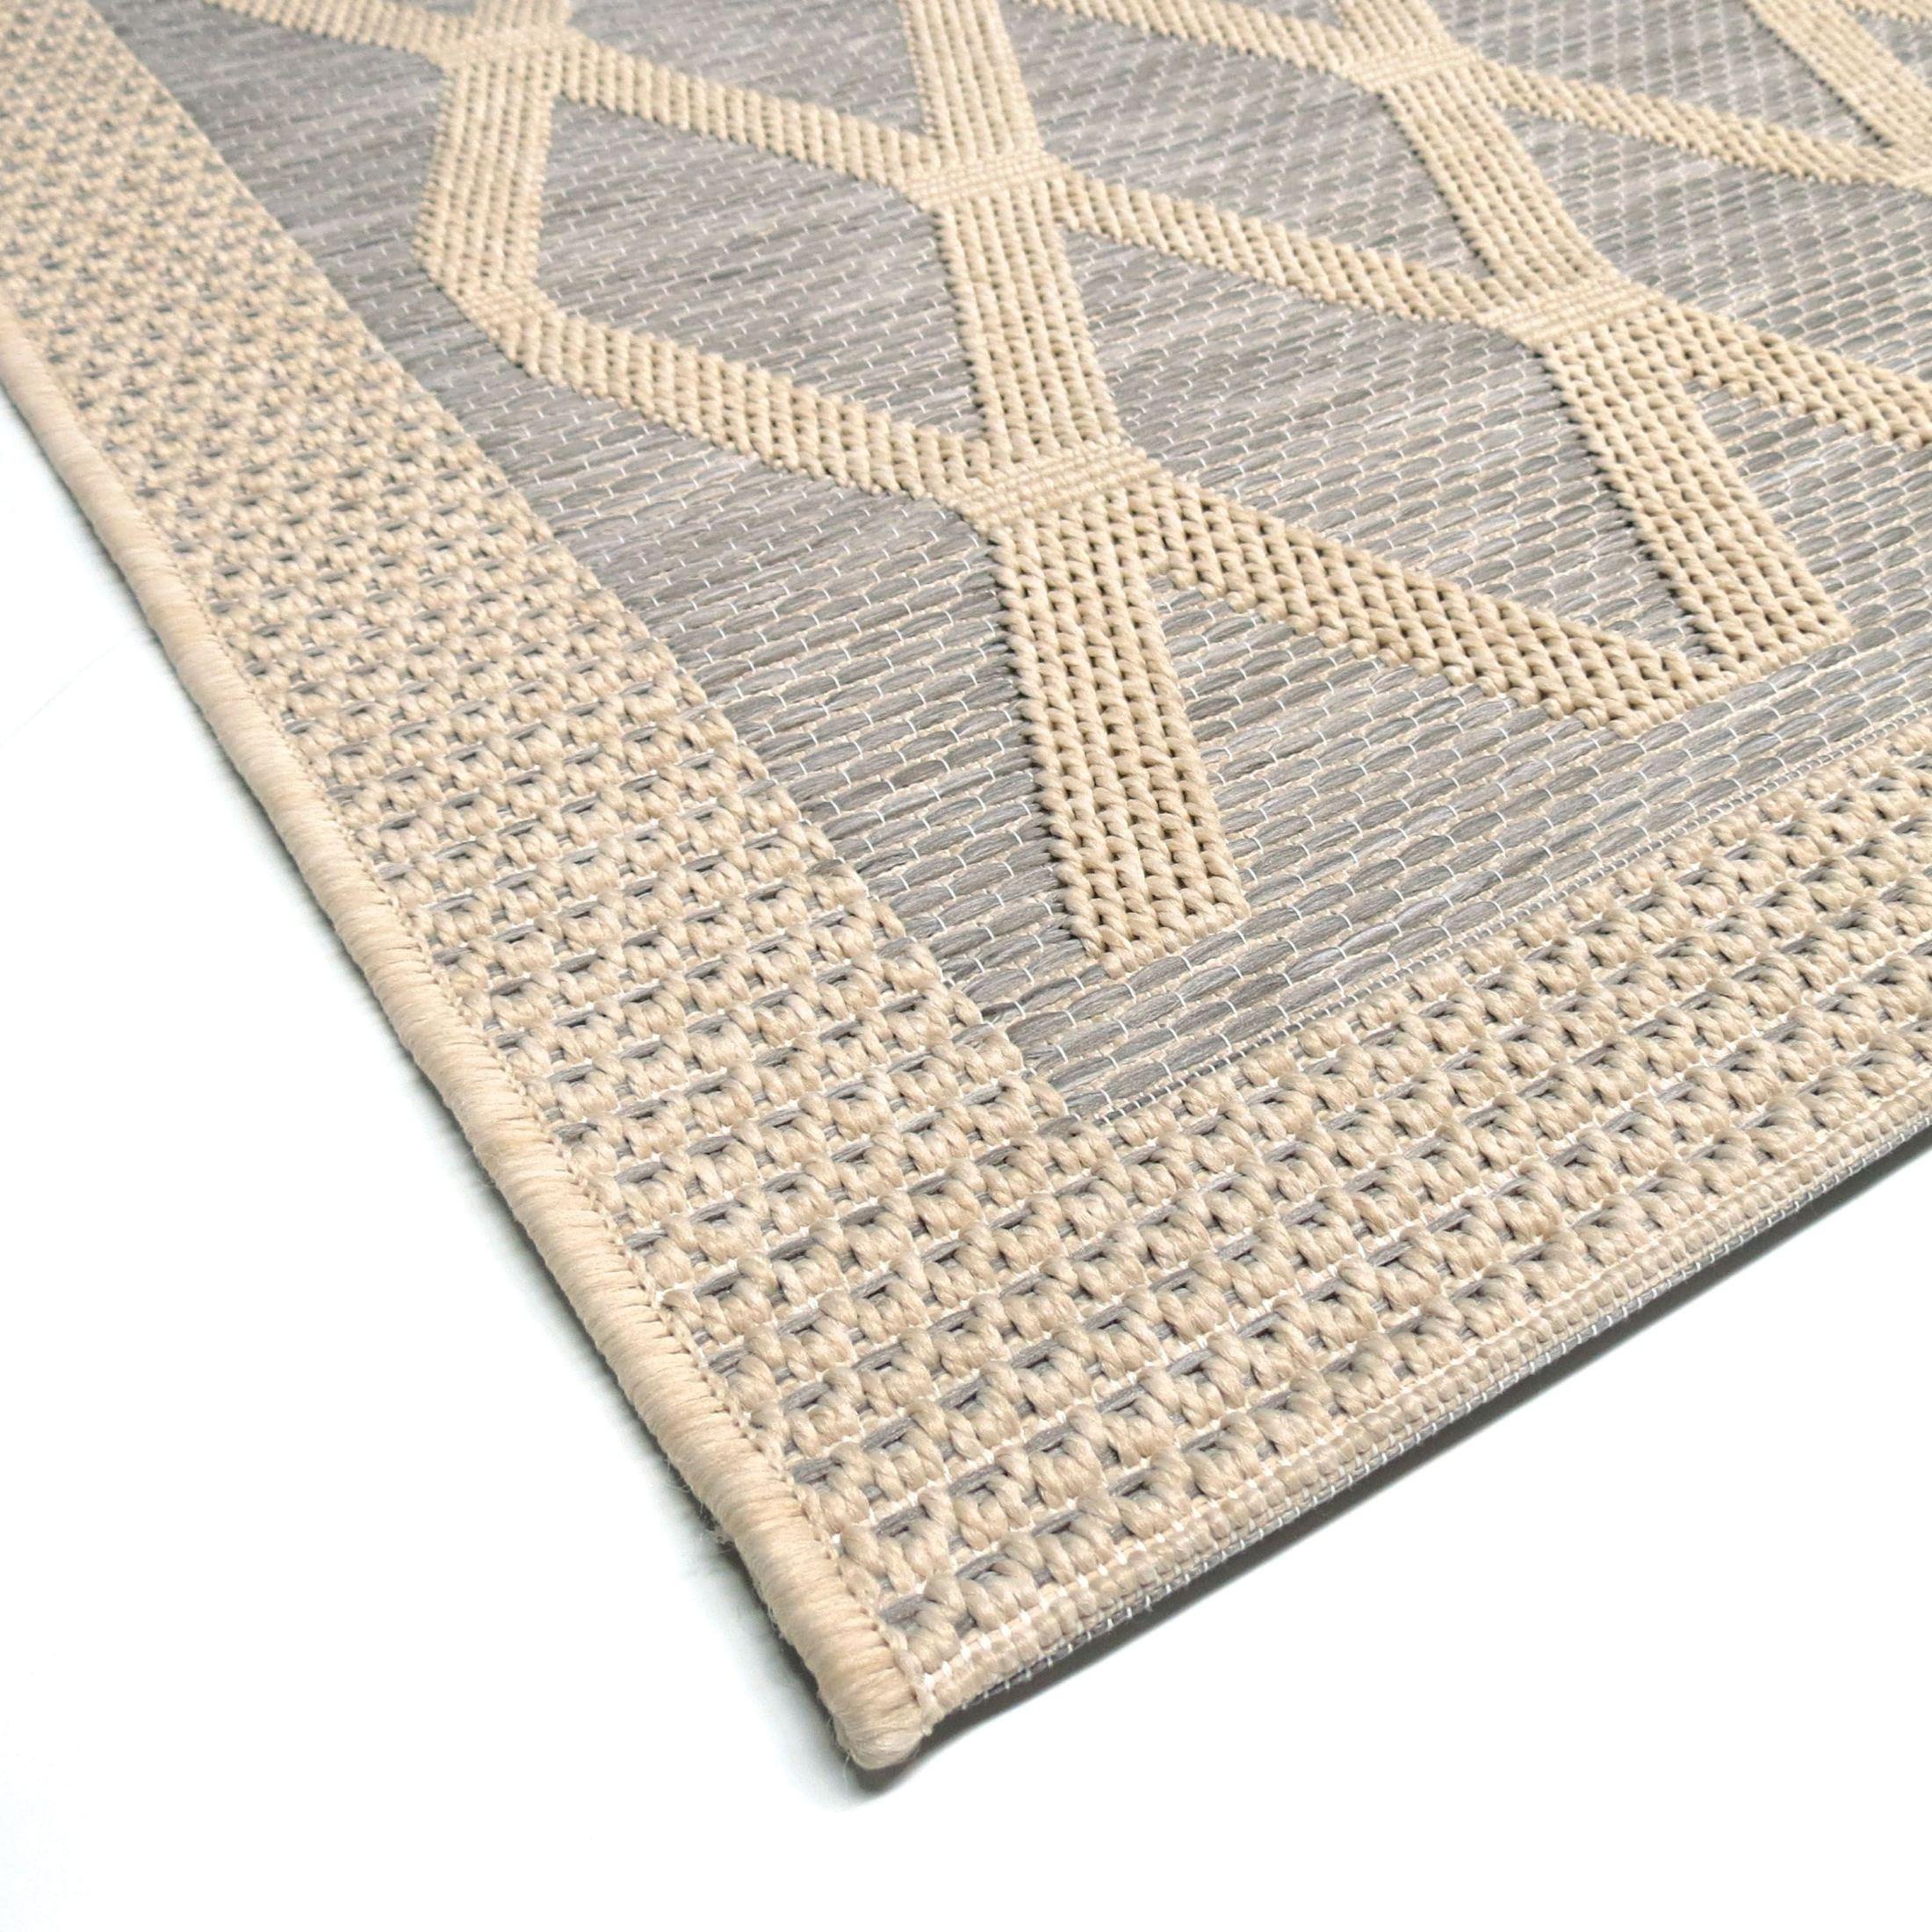 Outdoor 5x8 Area Rug: Orian Rugs Indoor/ Outdoor Diamonds Regal Dimension Gray